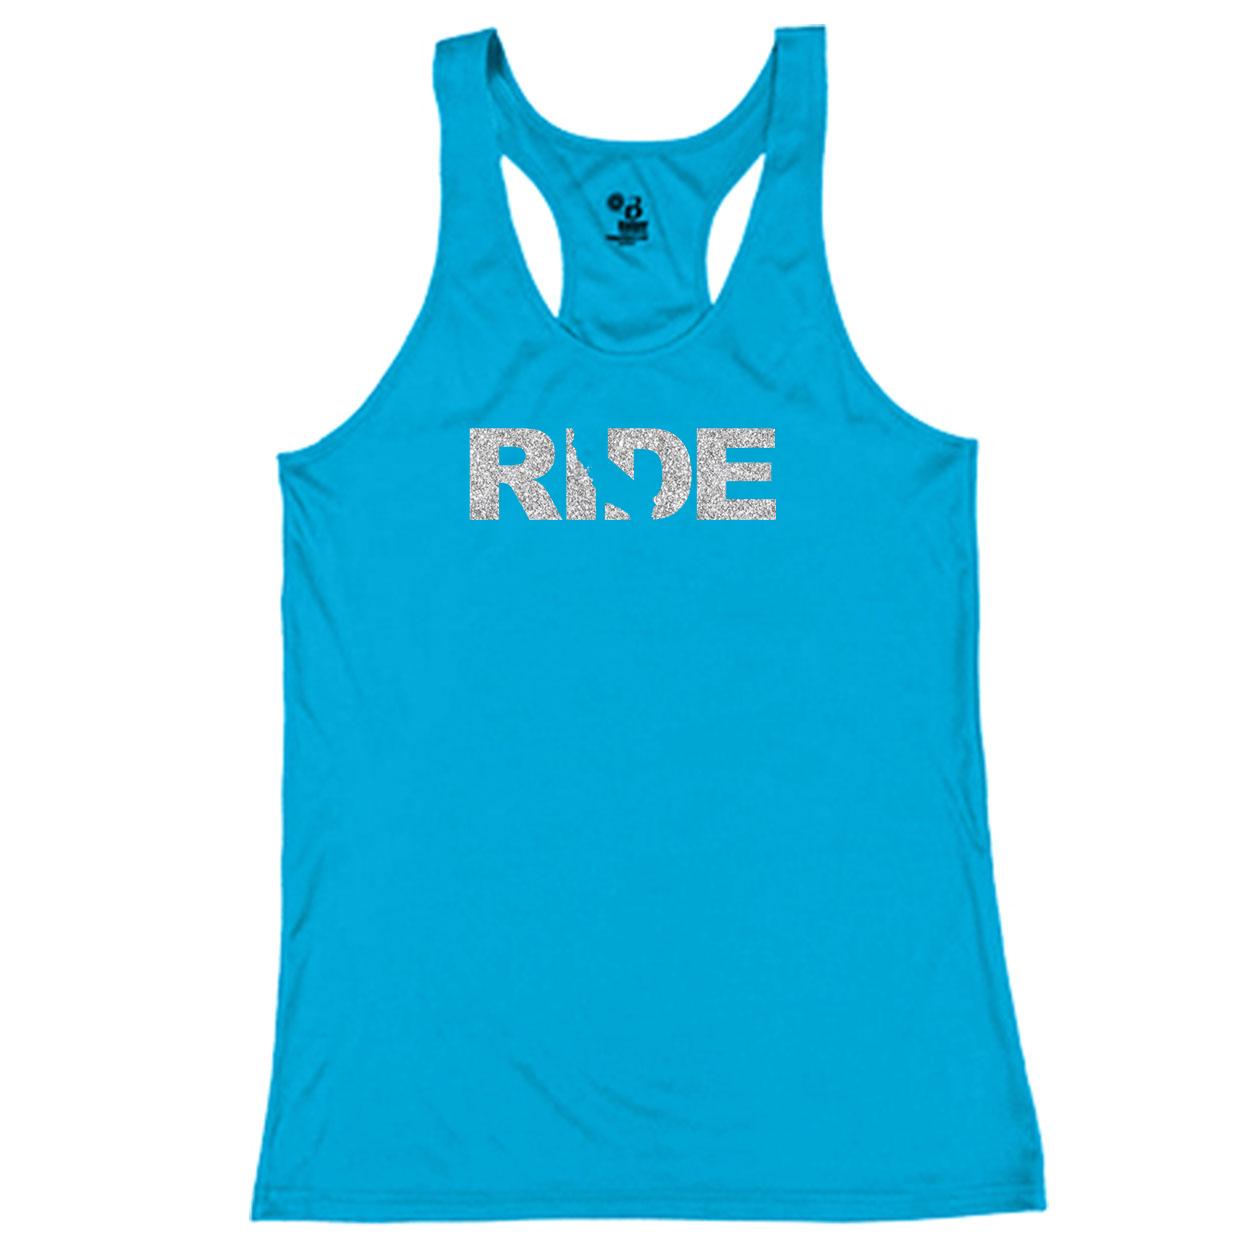 Ride California Classic Youth Girls Performance Racerback Tank Top Electric Blue (Glitter Silver Logo)